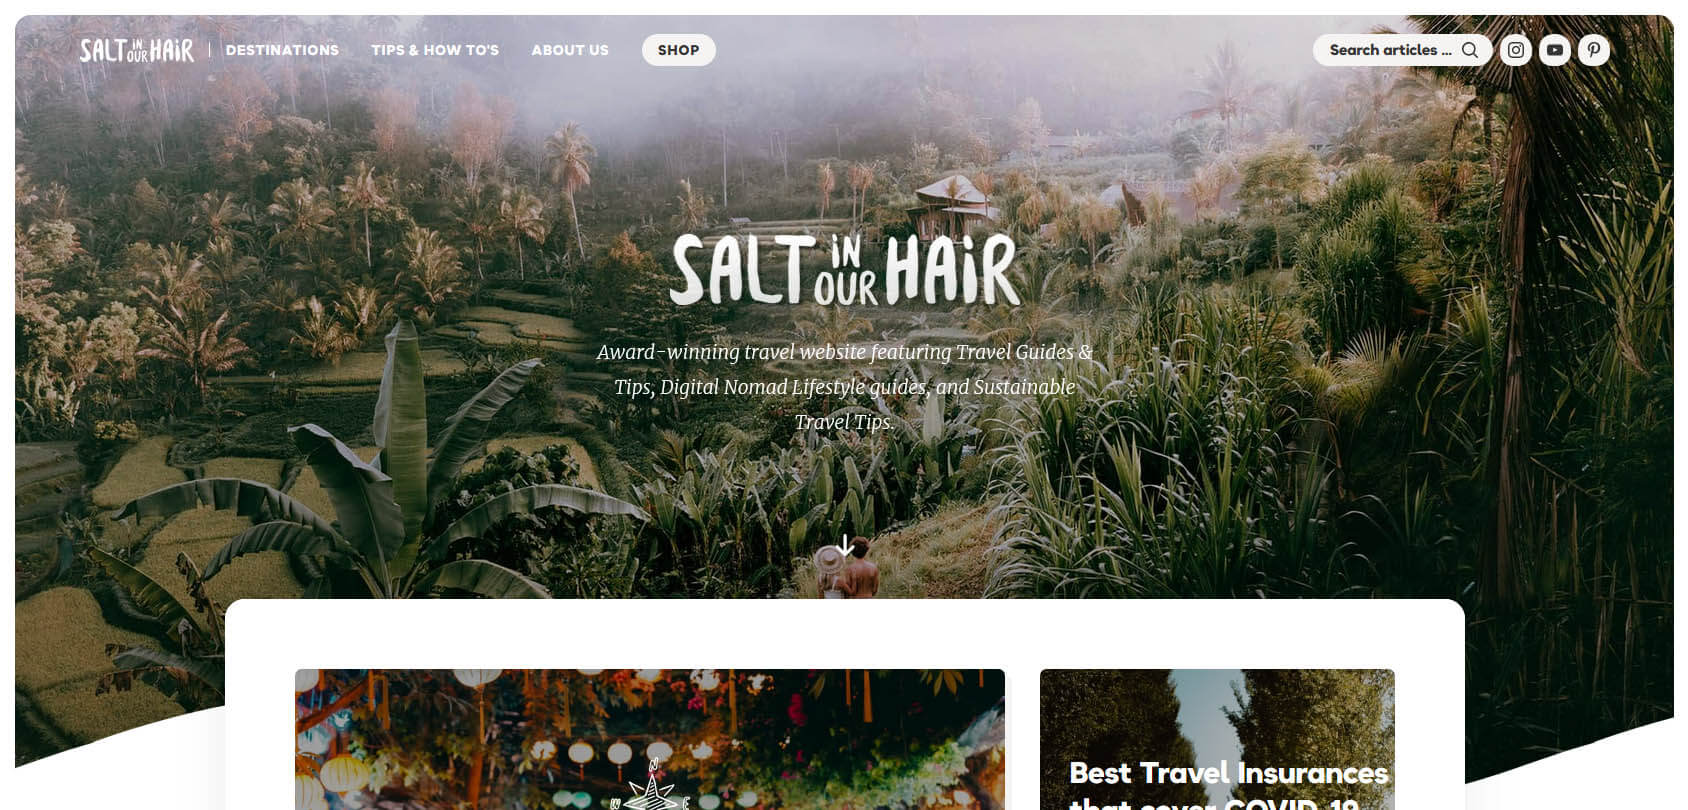 Salt in Our Hair Homepage